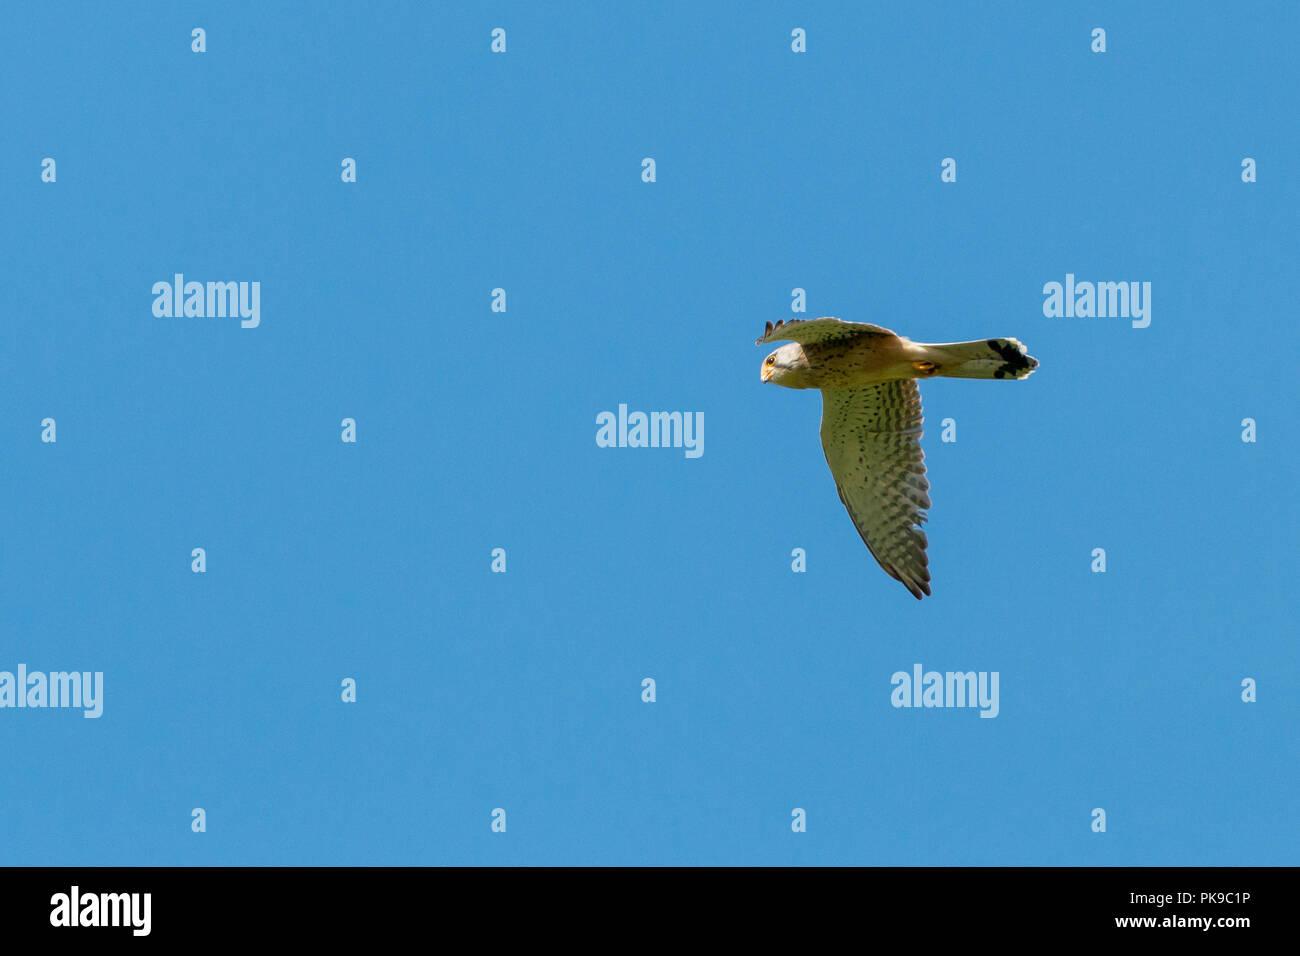 Hunting Common Kestrel Falco tinnunculus flying under blue sky in Eastbrookend park in Dagenham, England - Stock Image